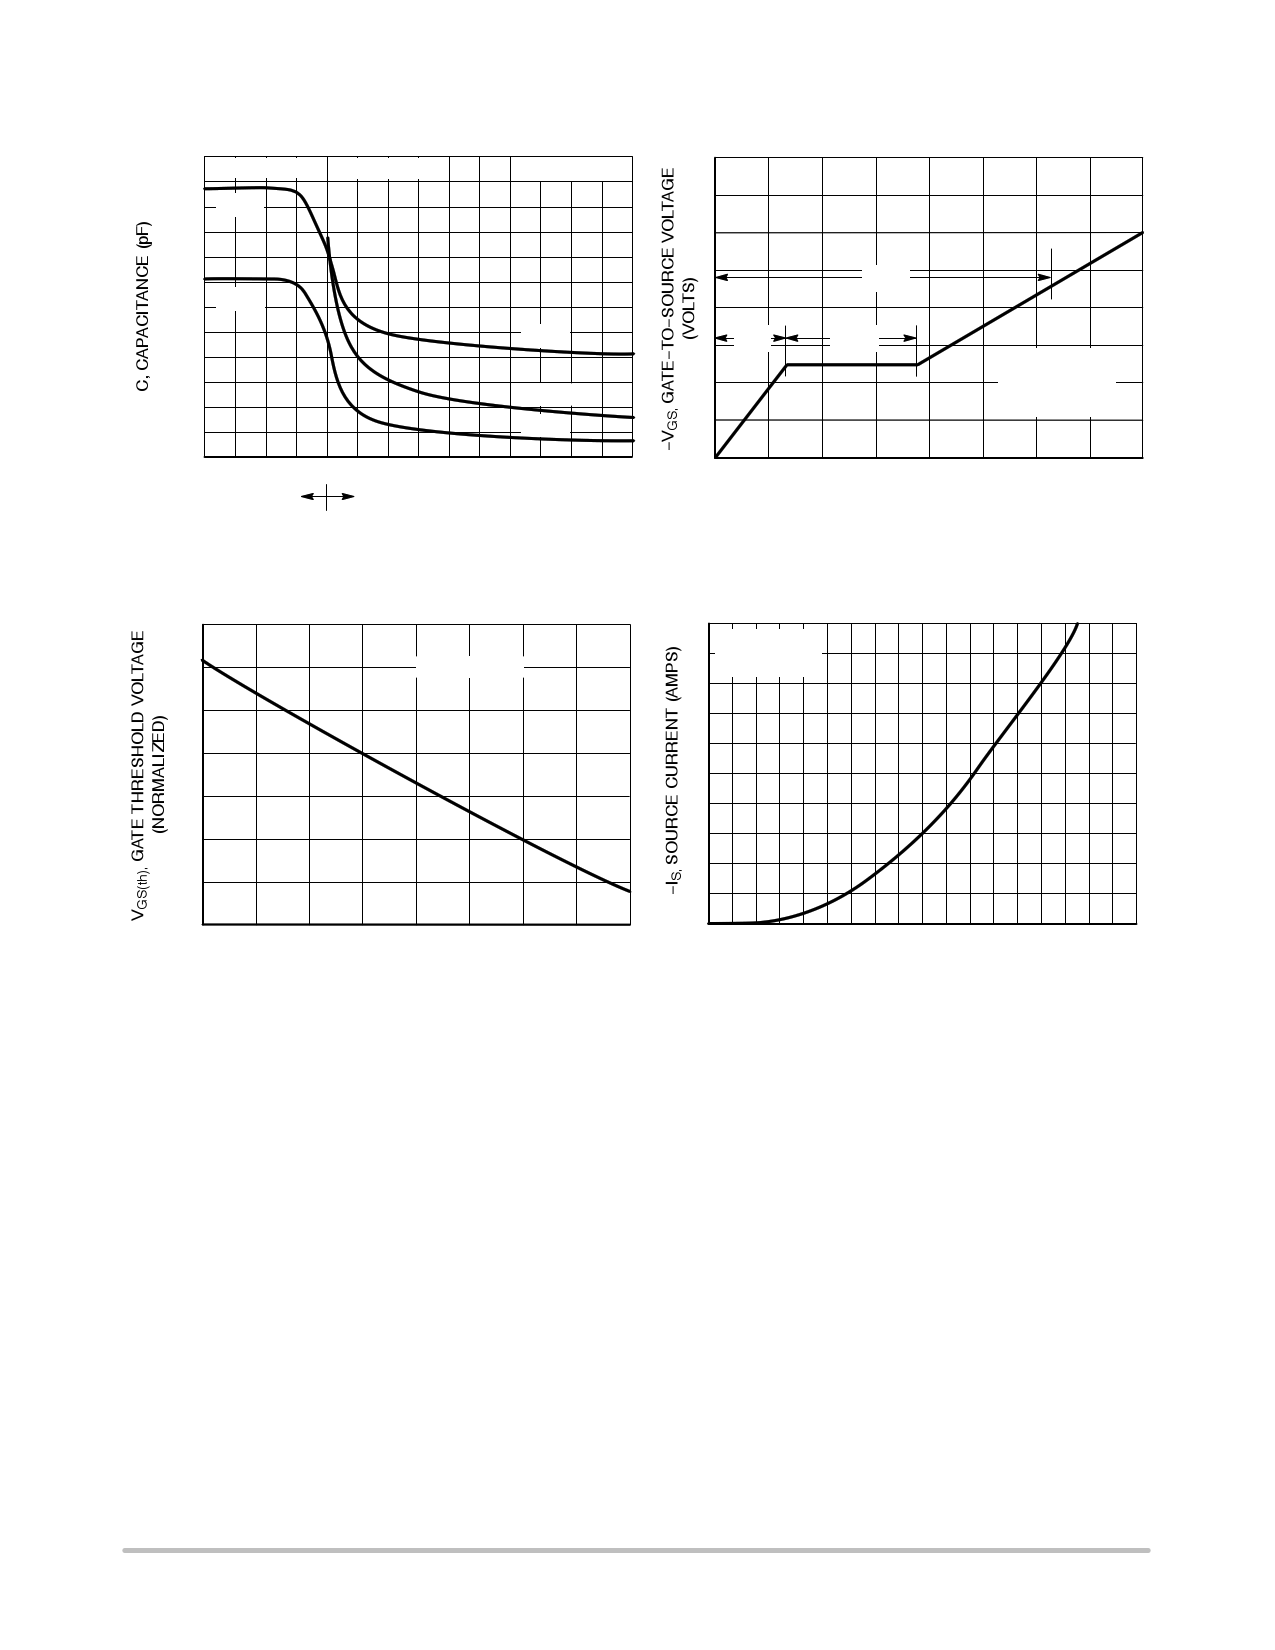 NTGS3441T1G pdf, 반도체, 판매, 대치품